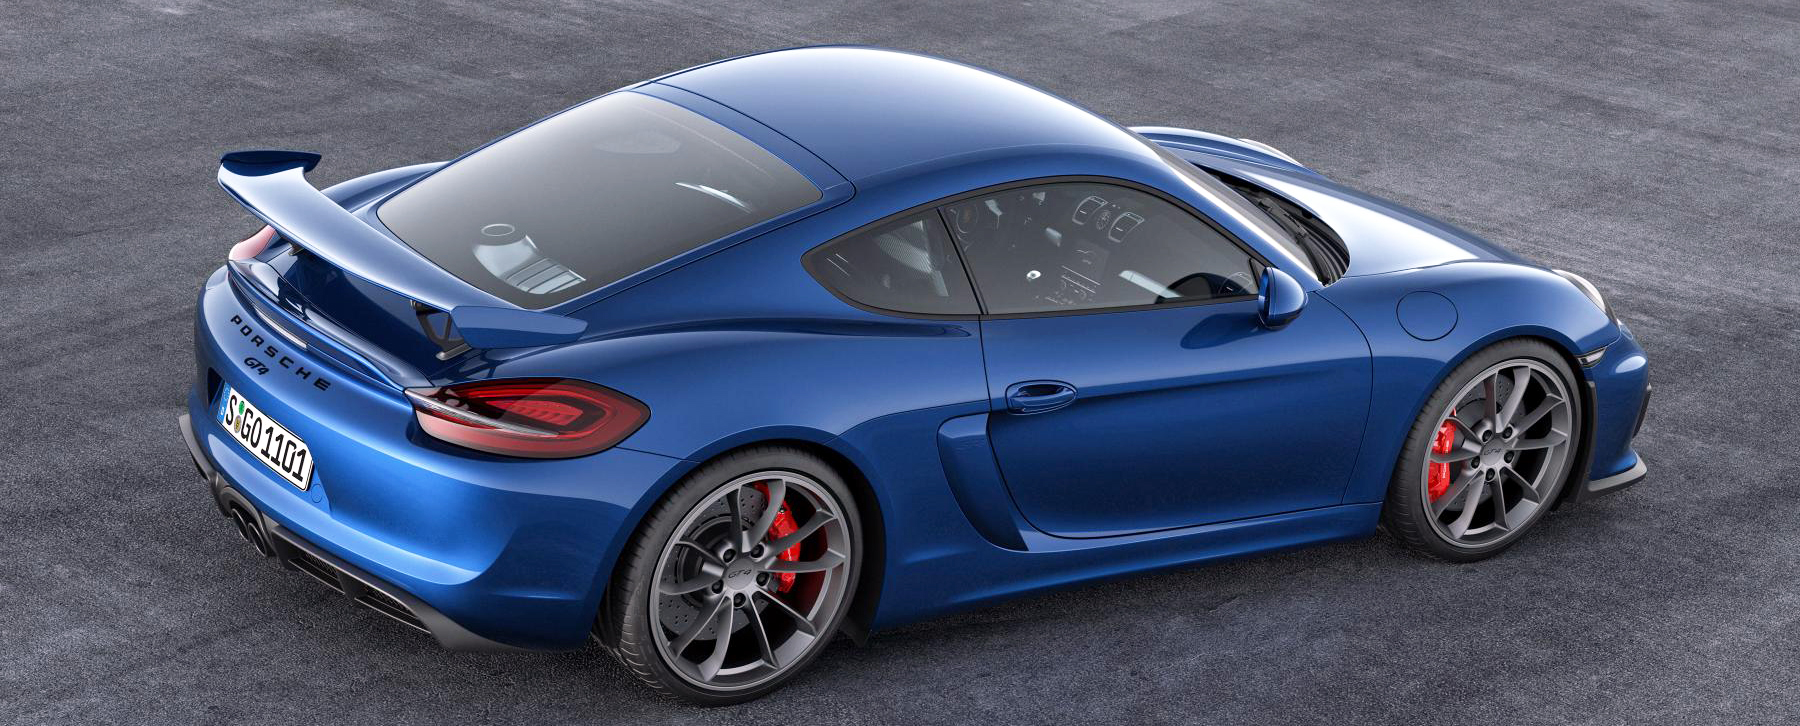 Cayman Gt4 2018 >> Porsche Cayman GT4 unveiled – 385 hp, manual only! Paul Tan - Image 309299